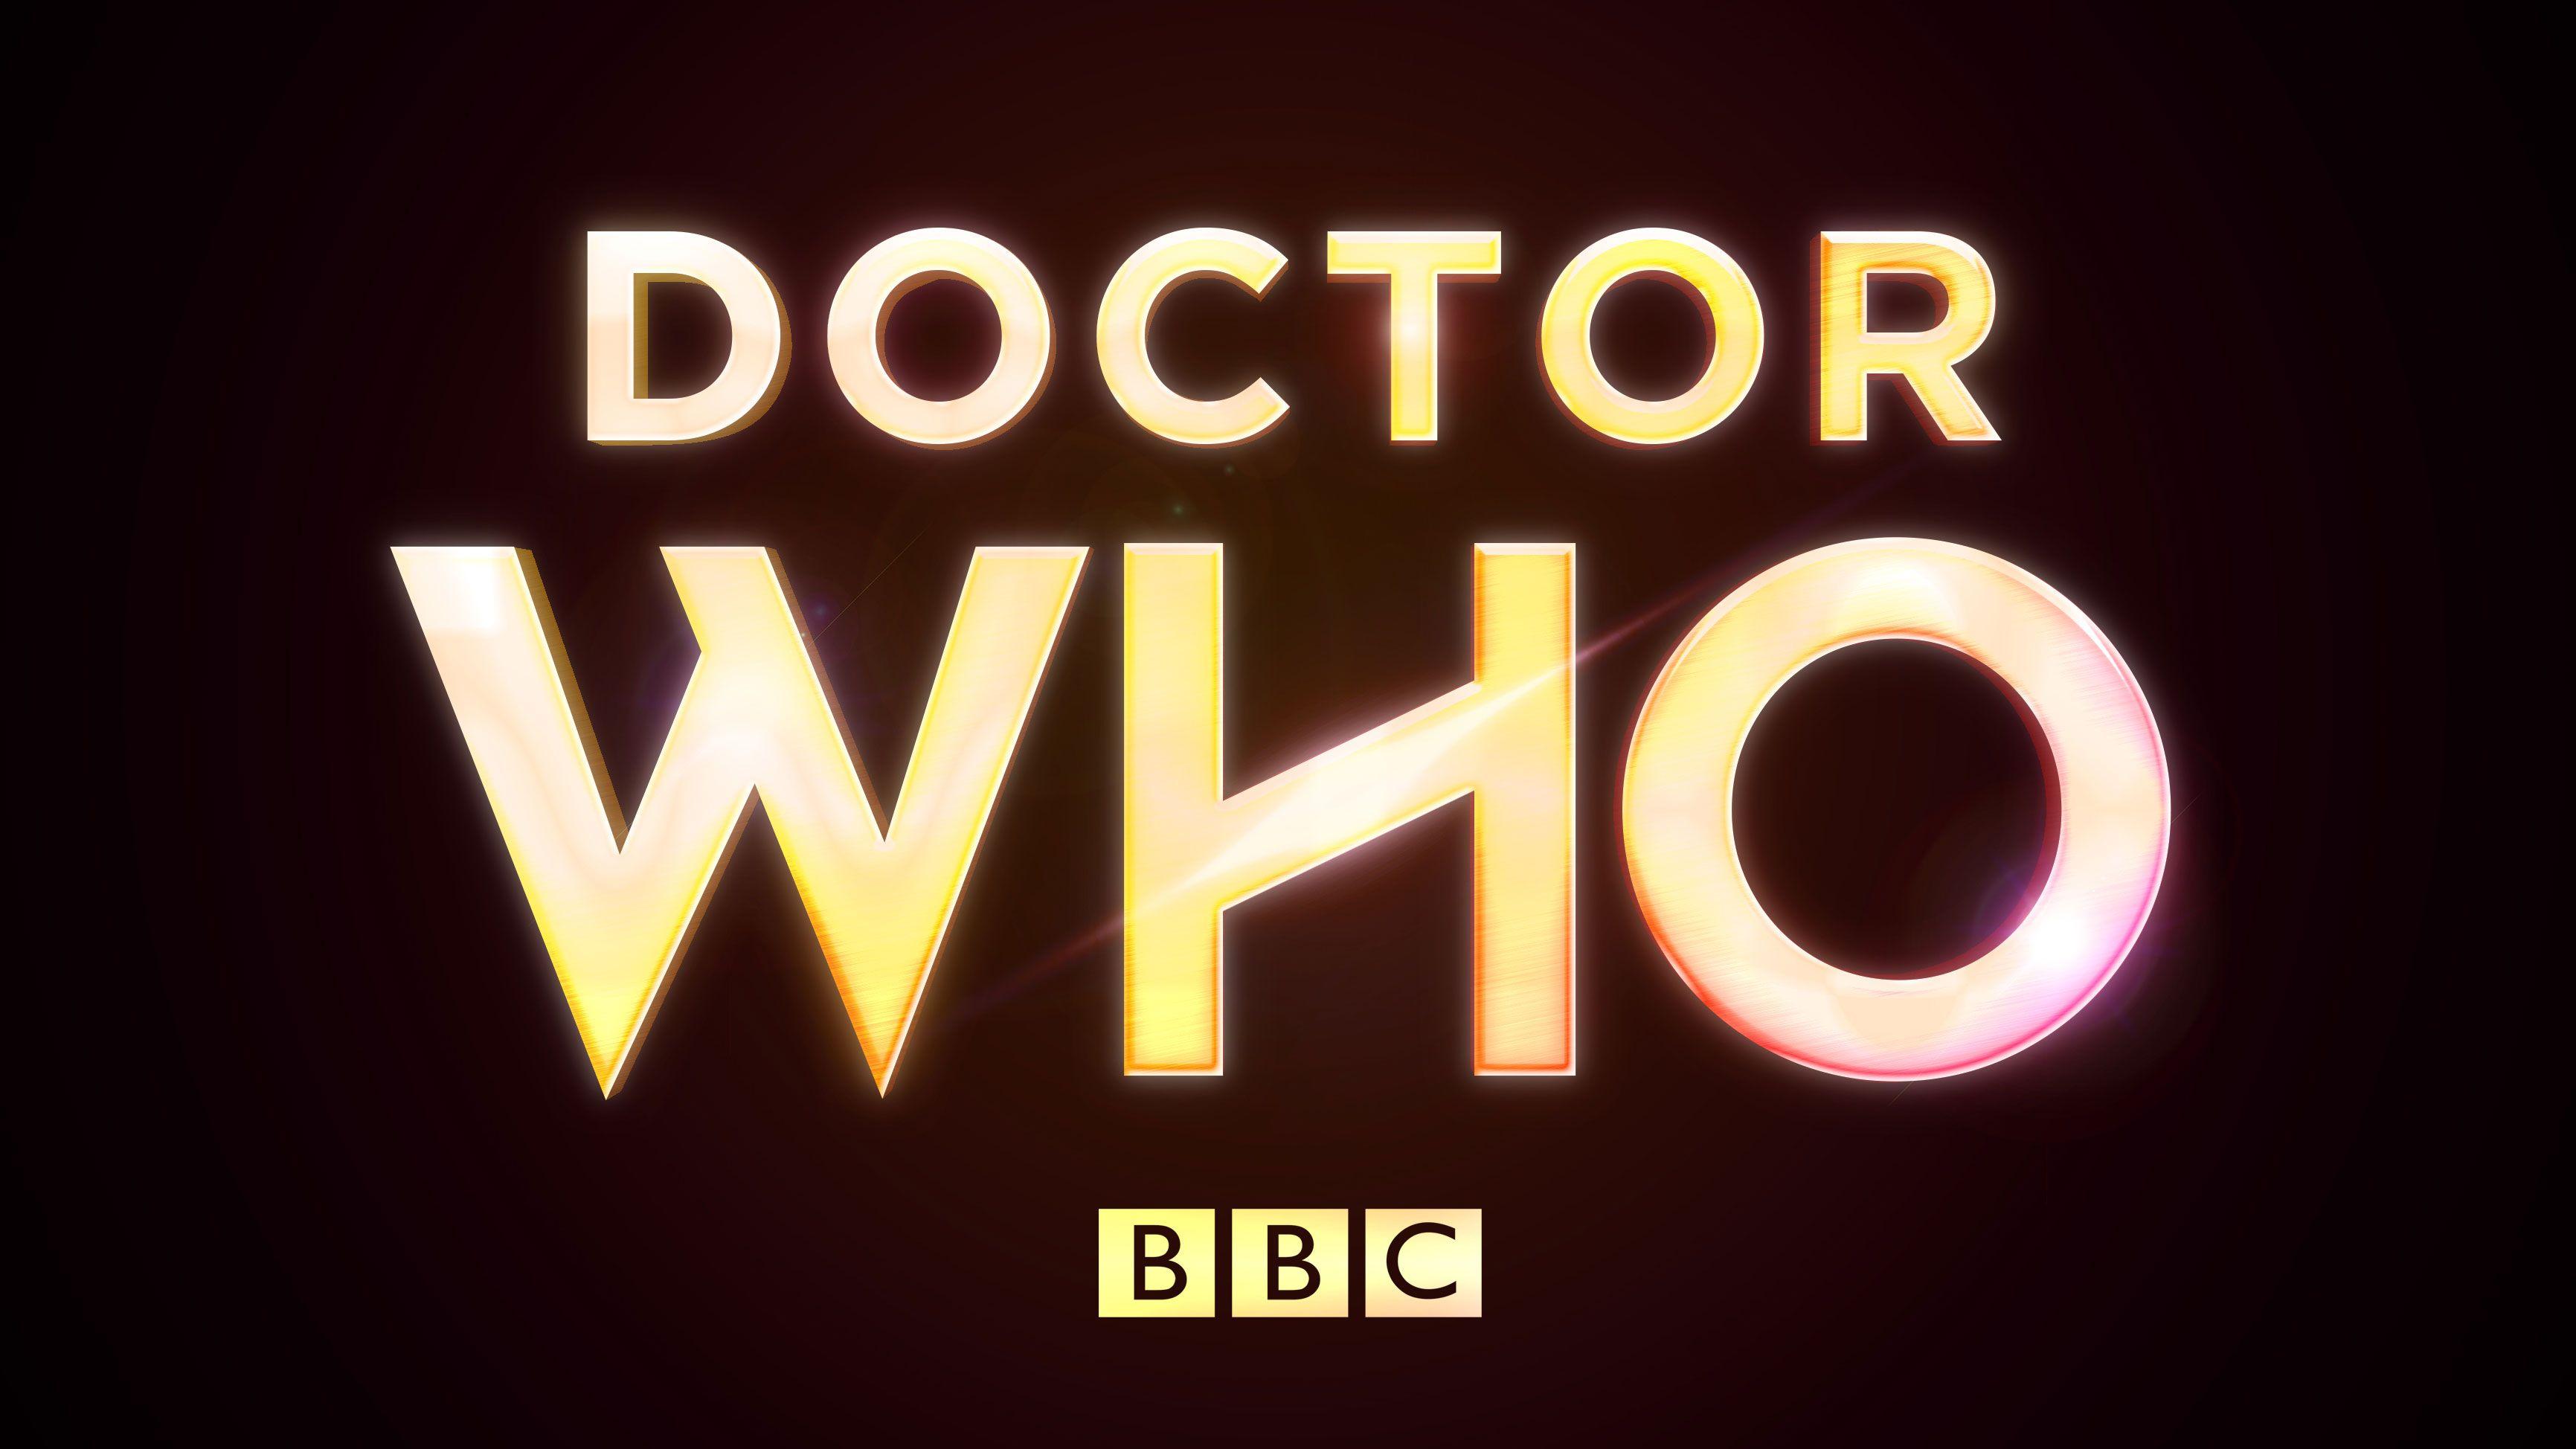 Designer S Fake Doctor Who Logo Tricks Fans Doctor Who Logo Doctor Who Doctor